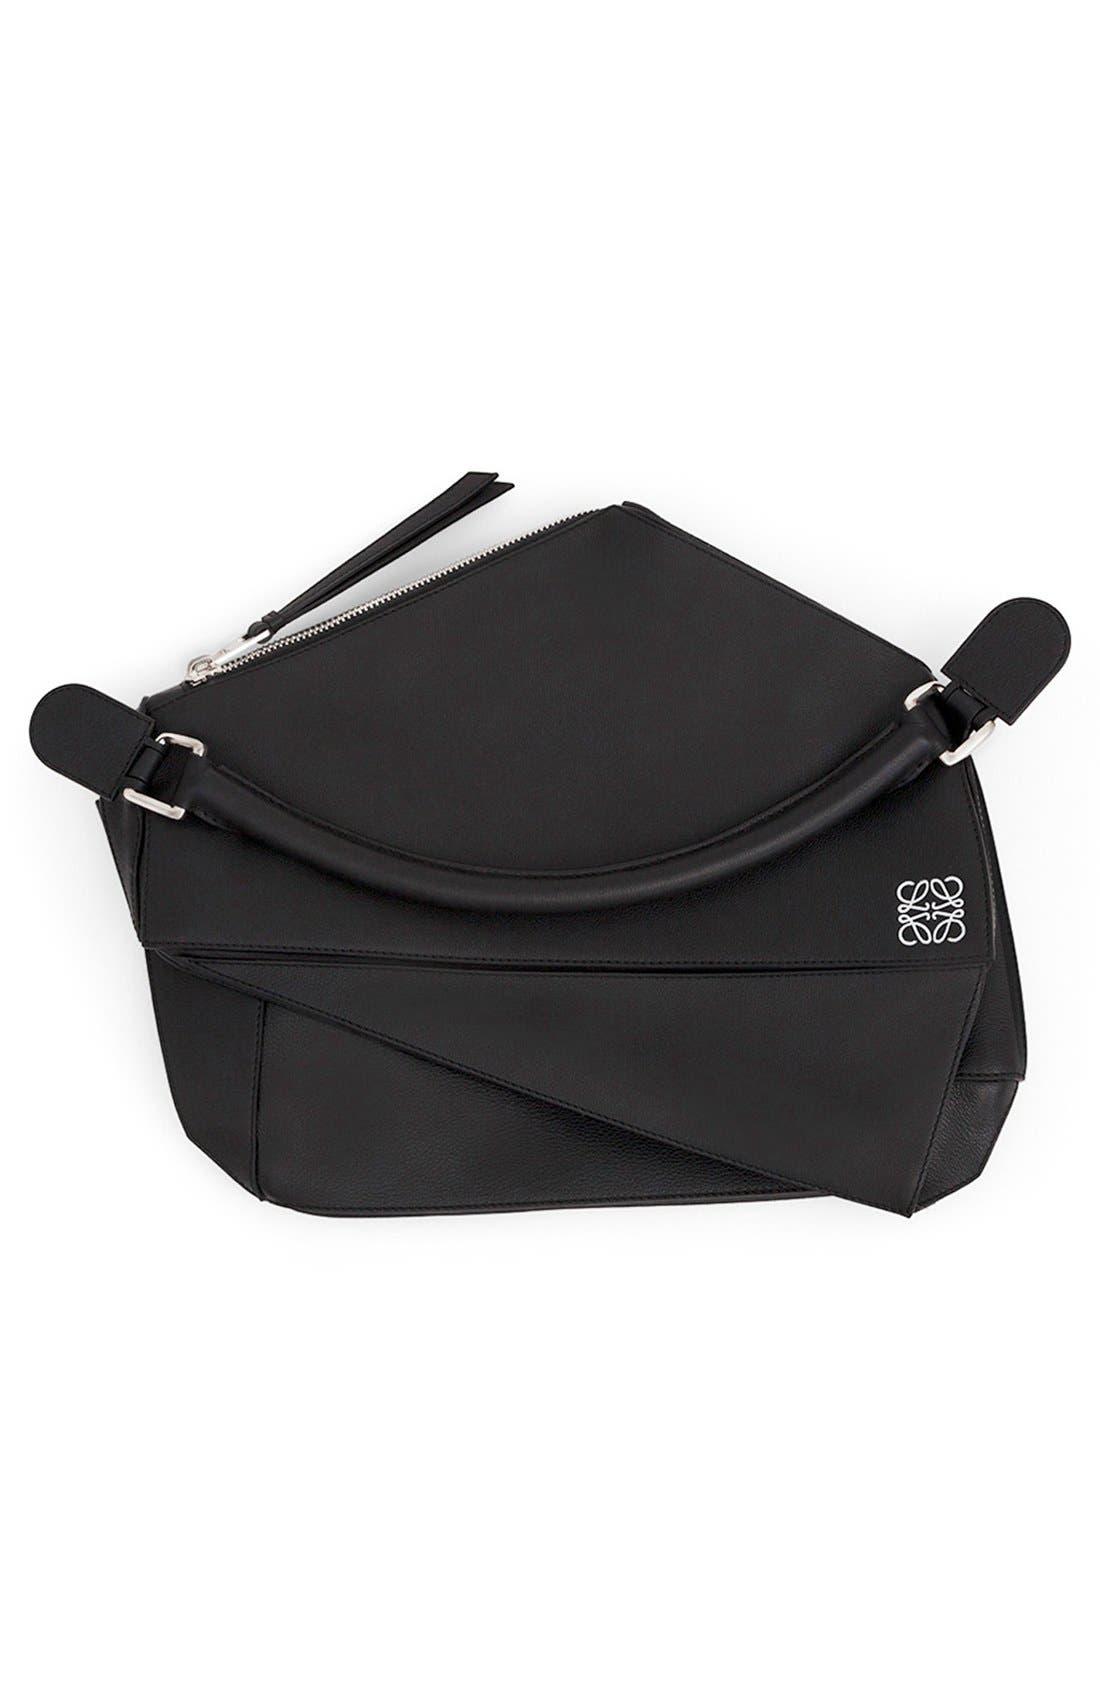 'Large Puzzle' Calfskin Leather Bag,                             Alternate thumbnail 6, color,                             001